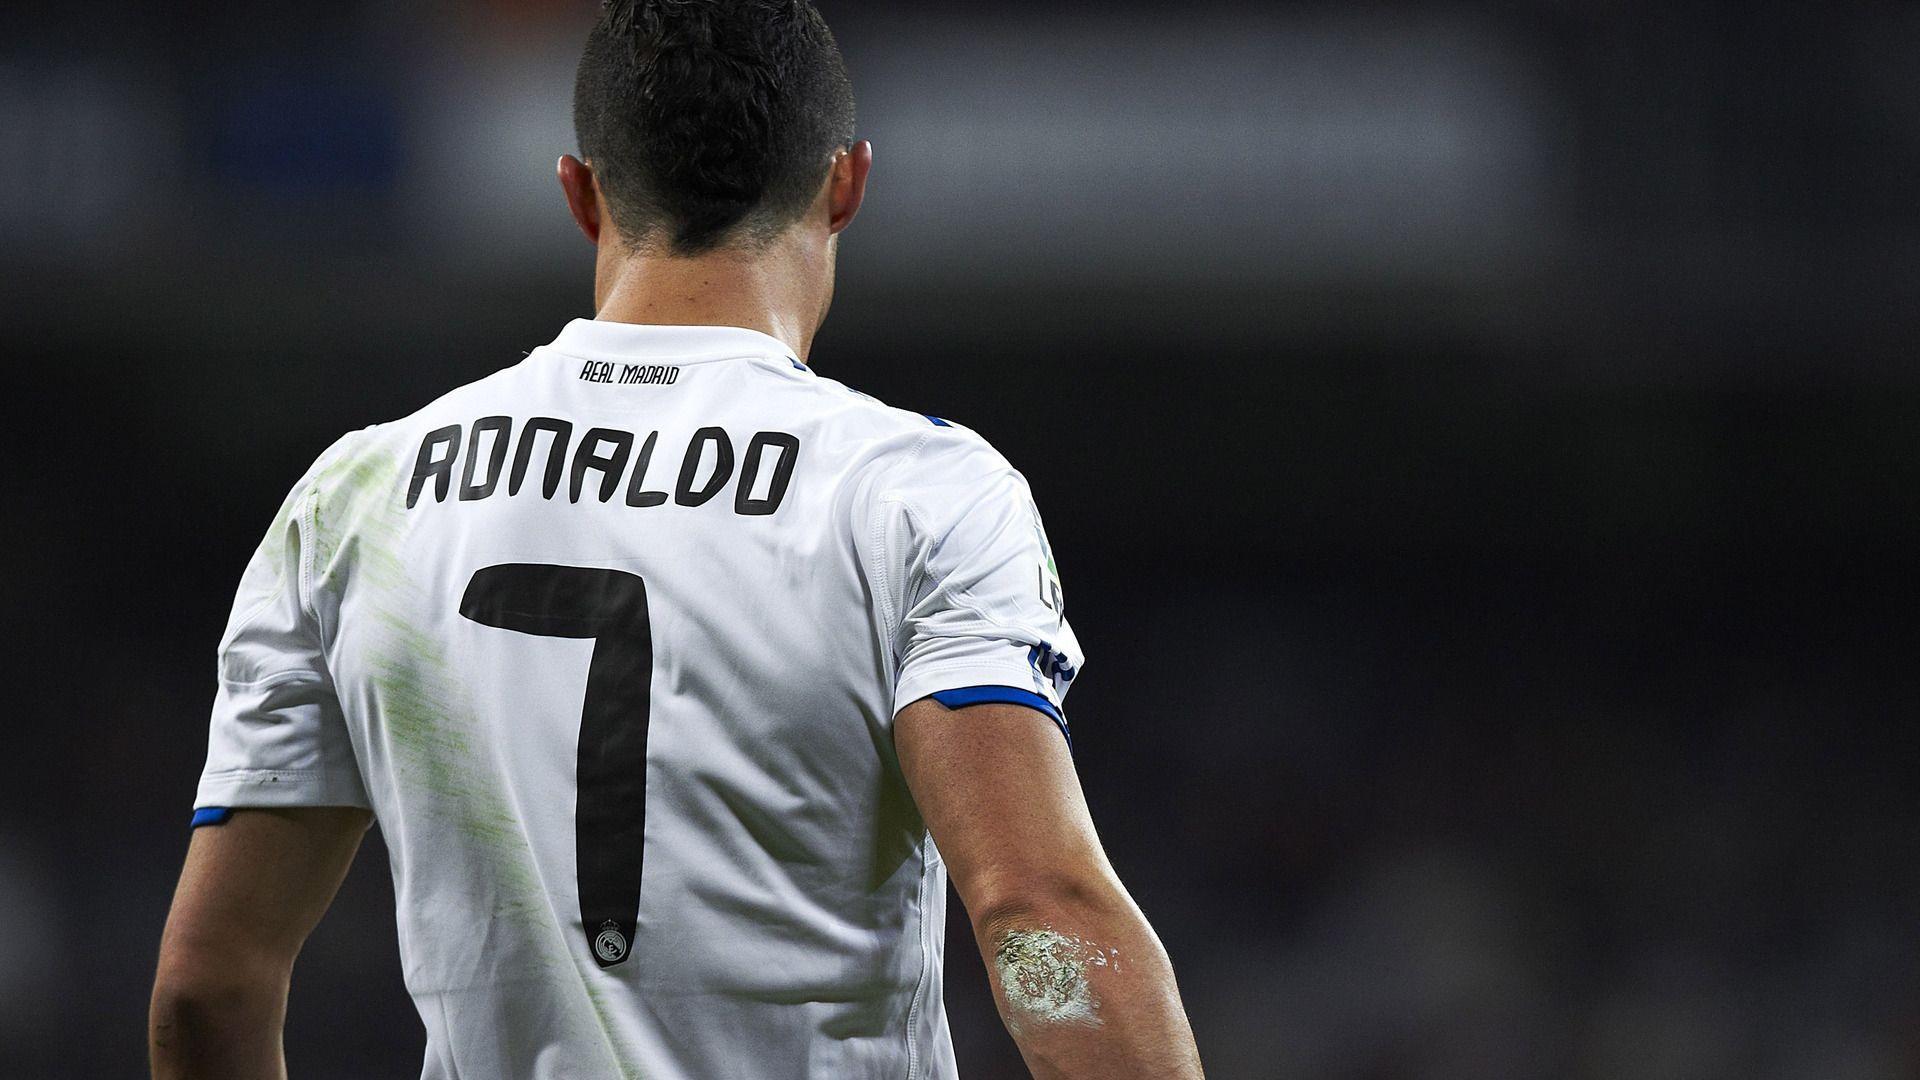 1920x1080 Cristiano Ronaldo HD Wallpaper 2019. Best Of CR7